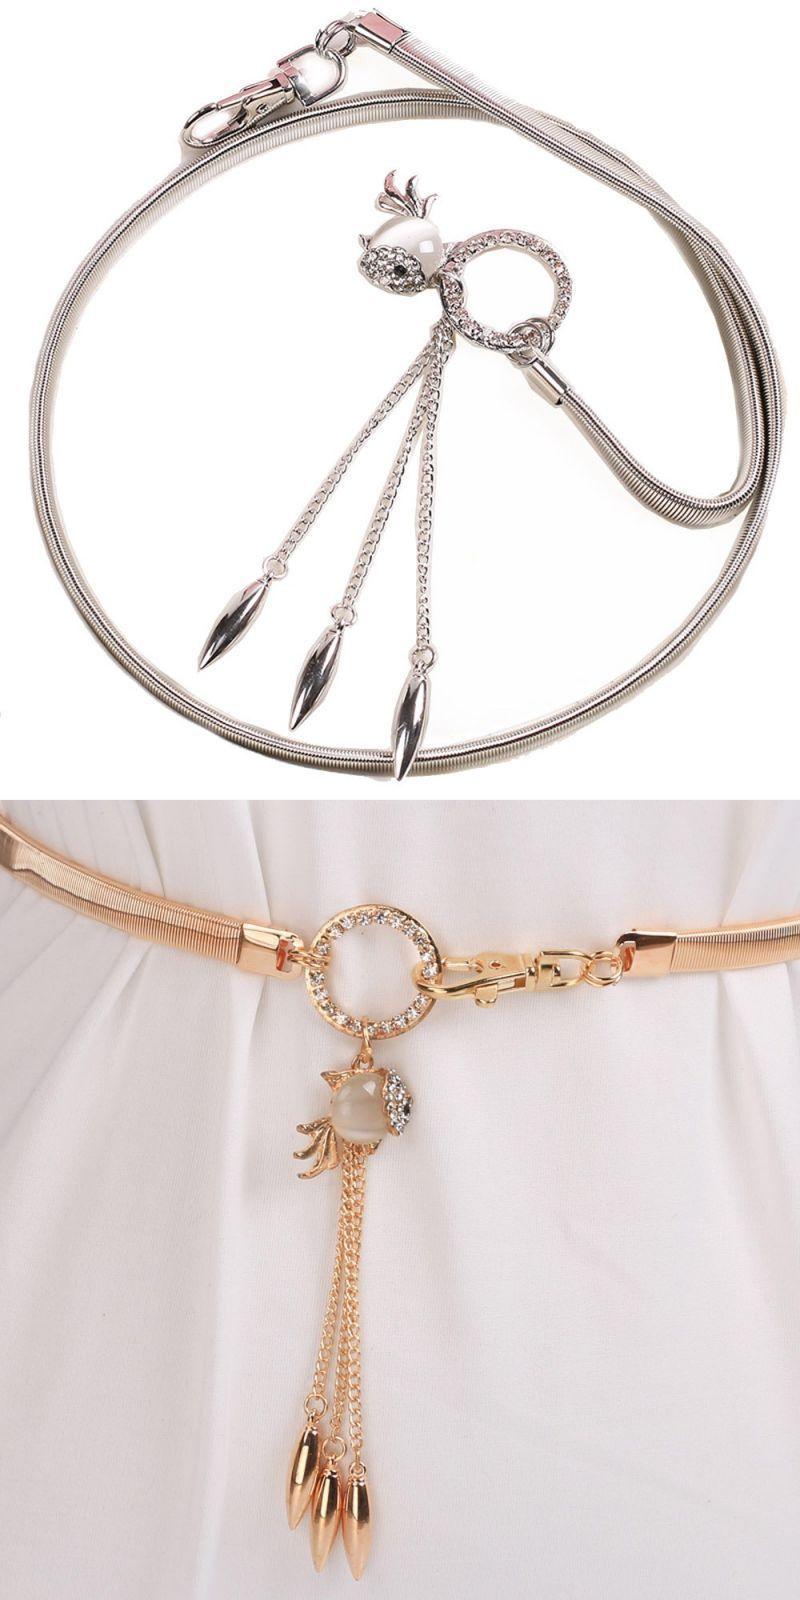 b7e9ee8daa4 Women's lady fashion goldfish pendant metal chain style belt body ...